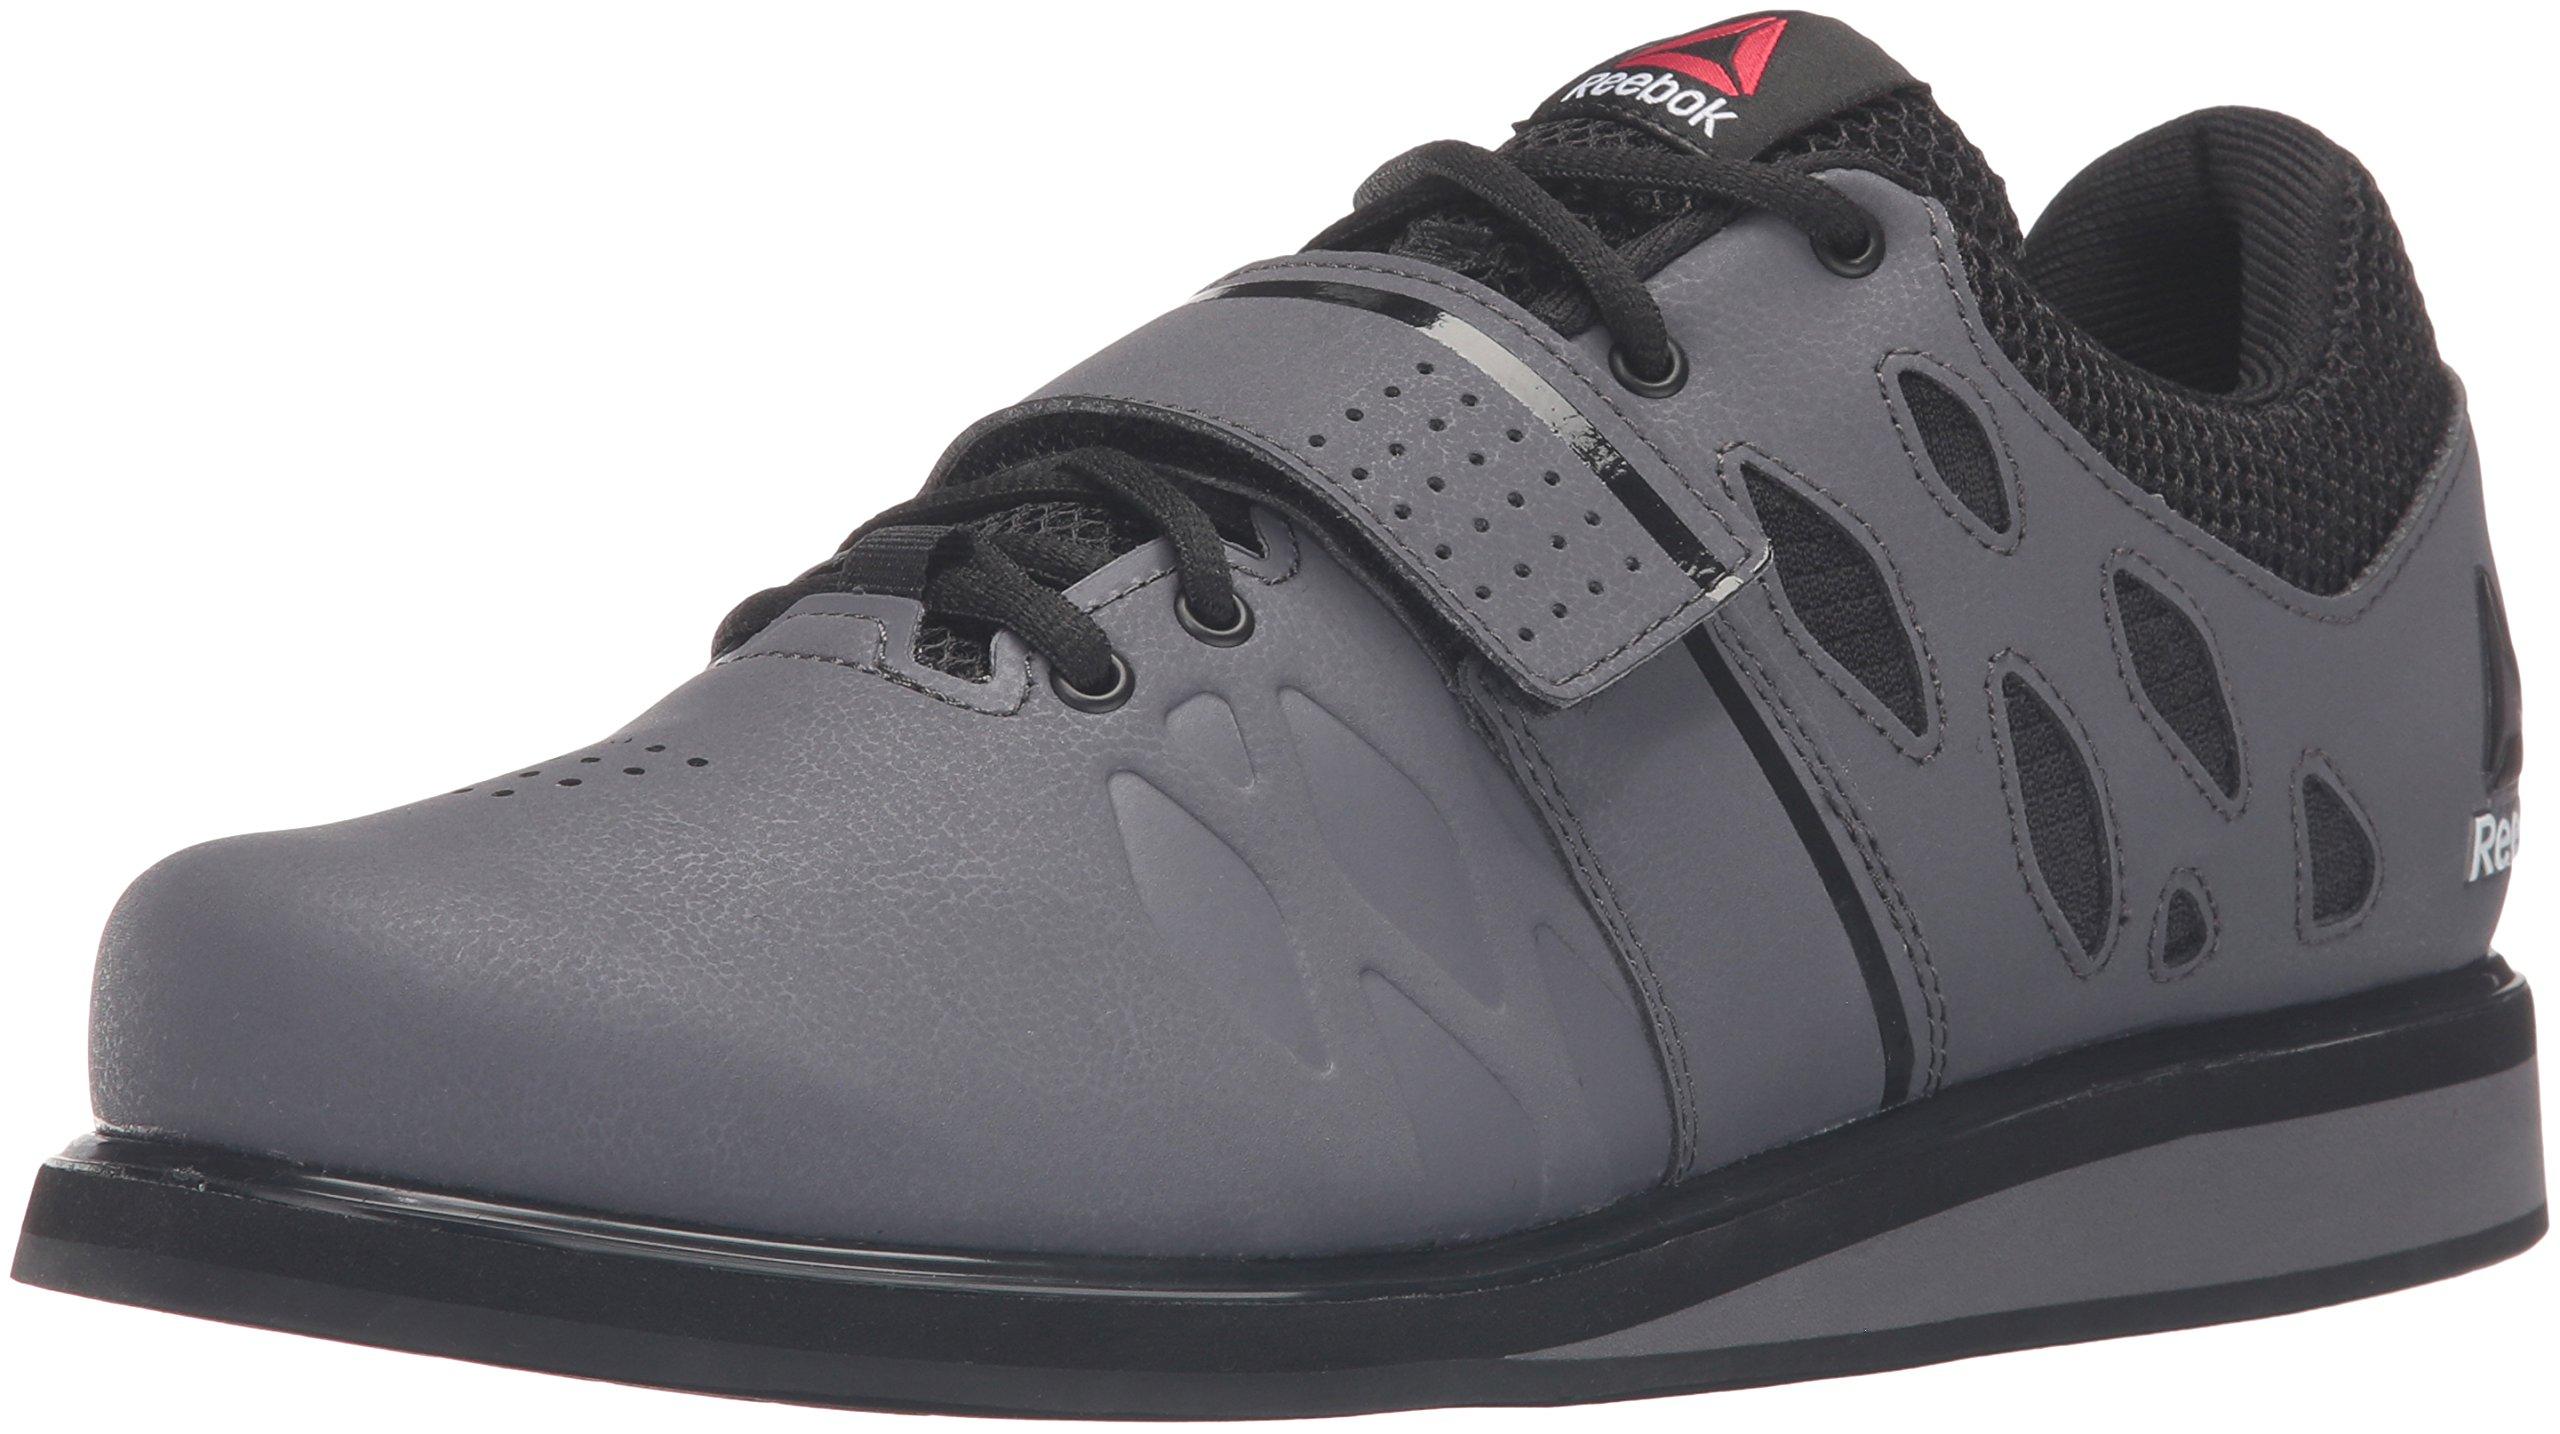 Reebok Men's Lifter Pr Cross-Trainer Shoe, Ash Grey/Black/White, 7 M US by Reebok (Image #1)